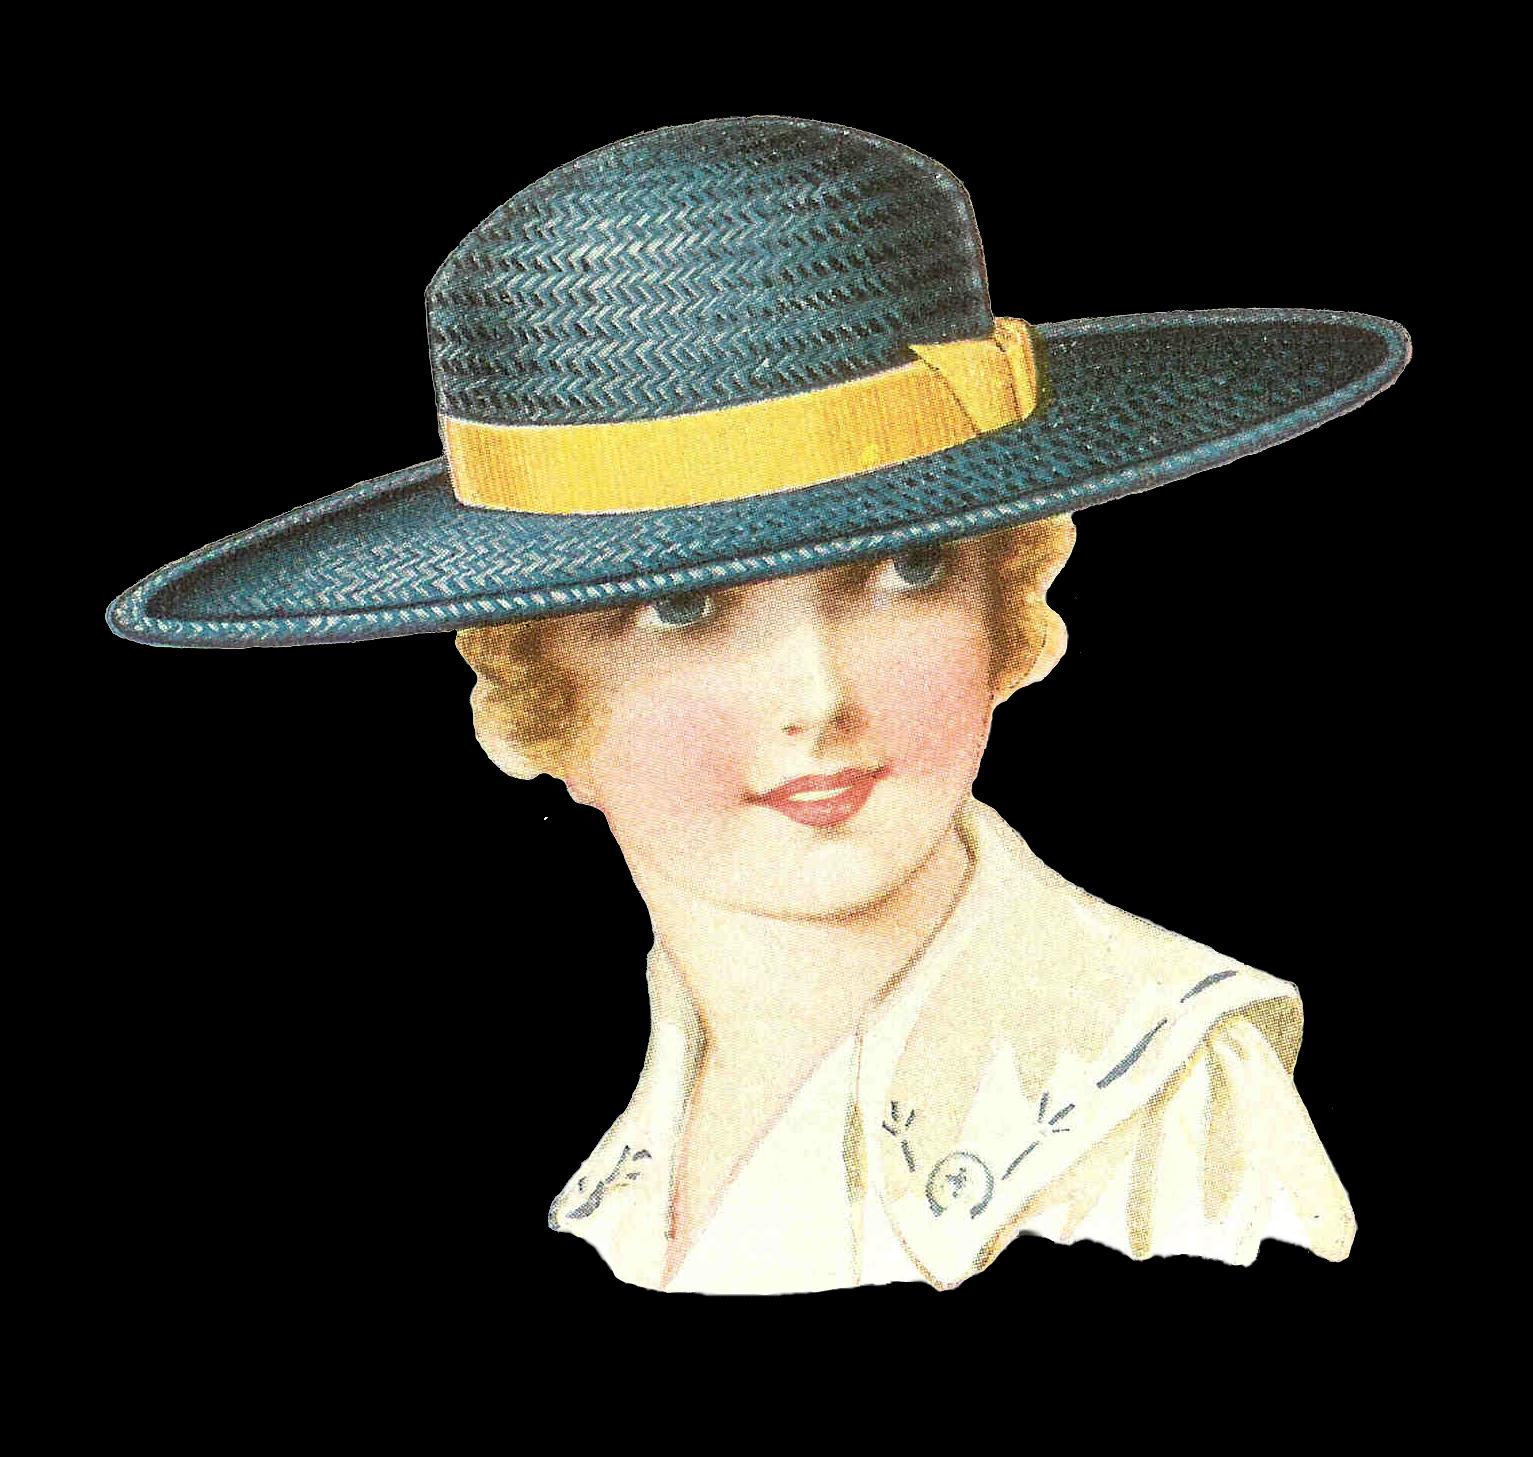 Fashion clipart fancy hat. Antique images july this